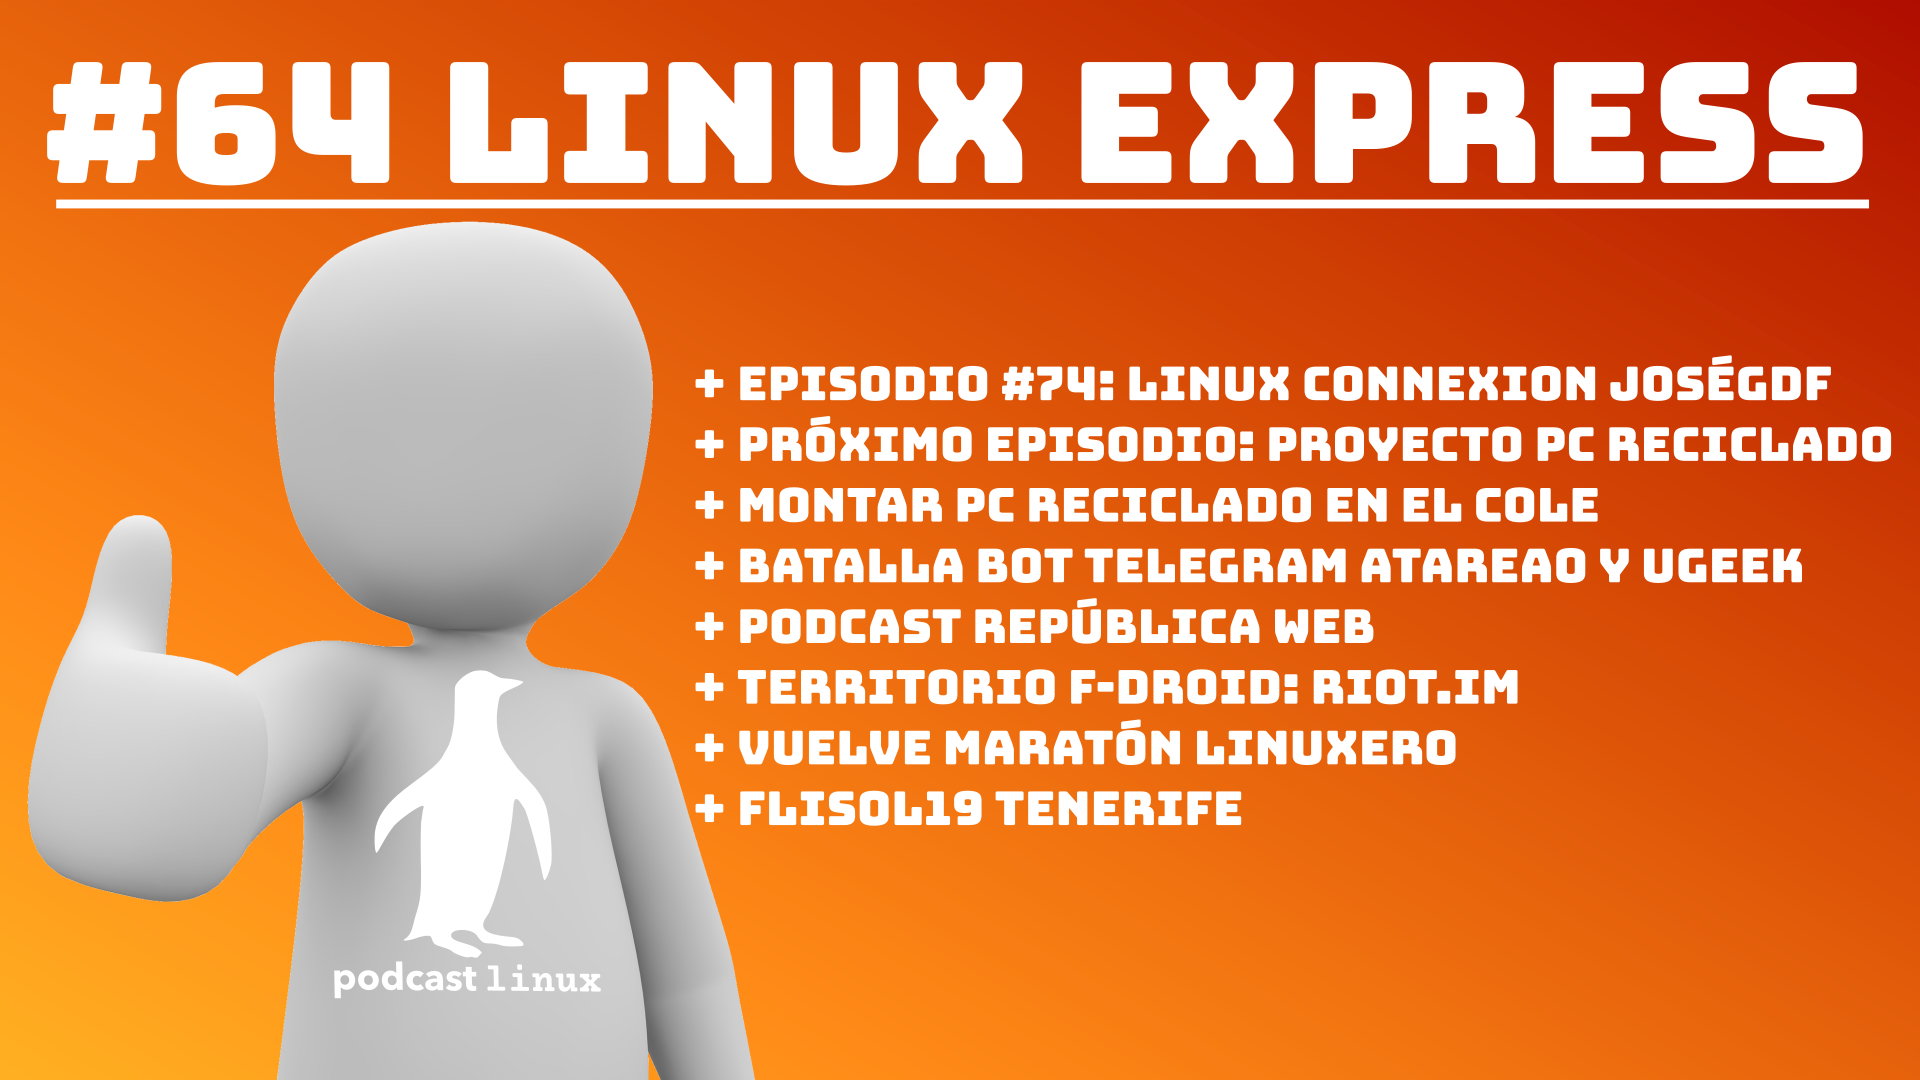 #64 Linux Express